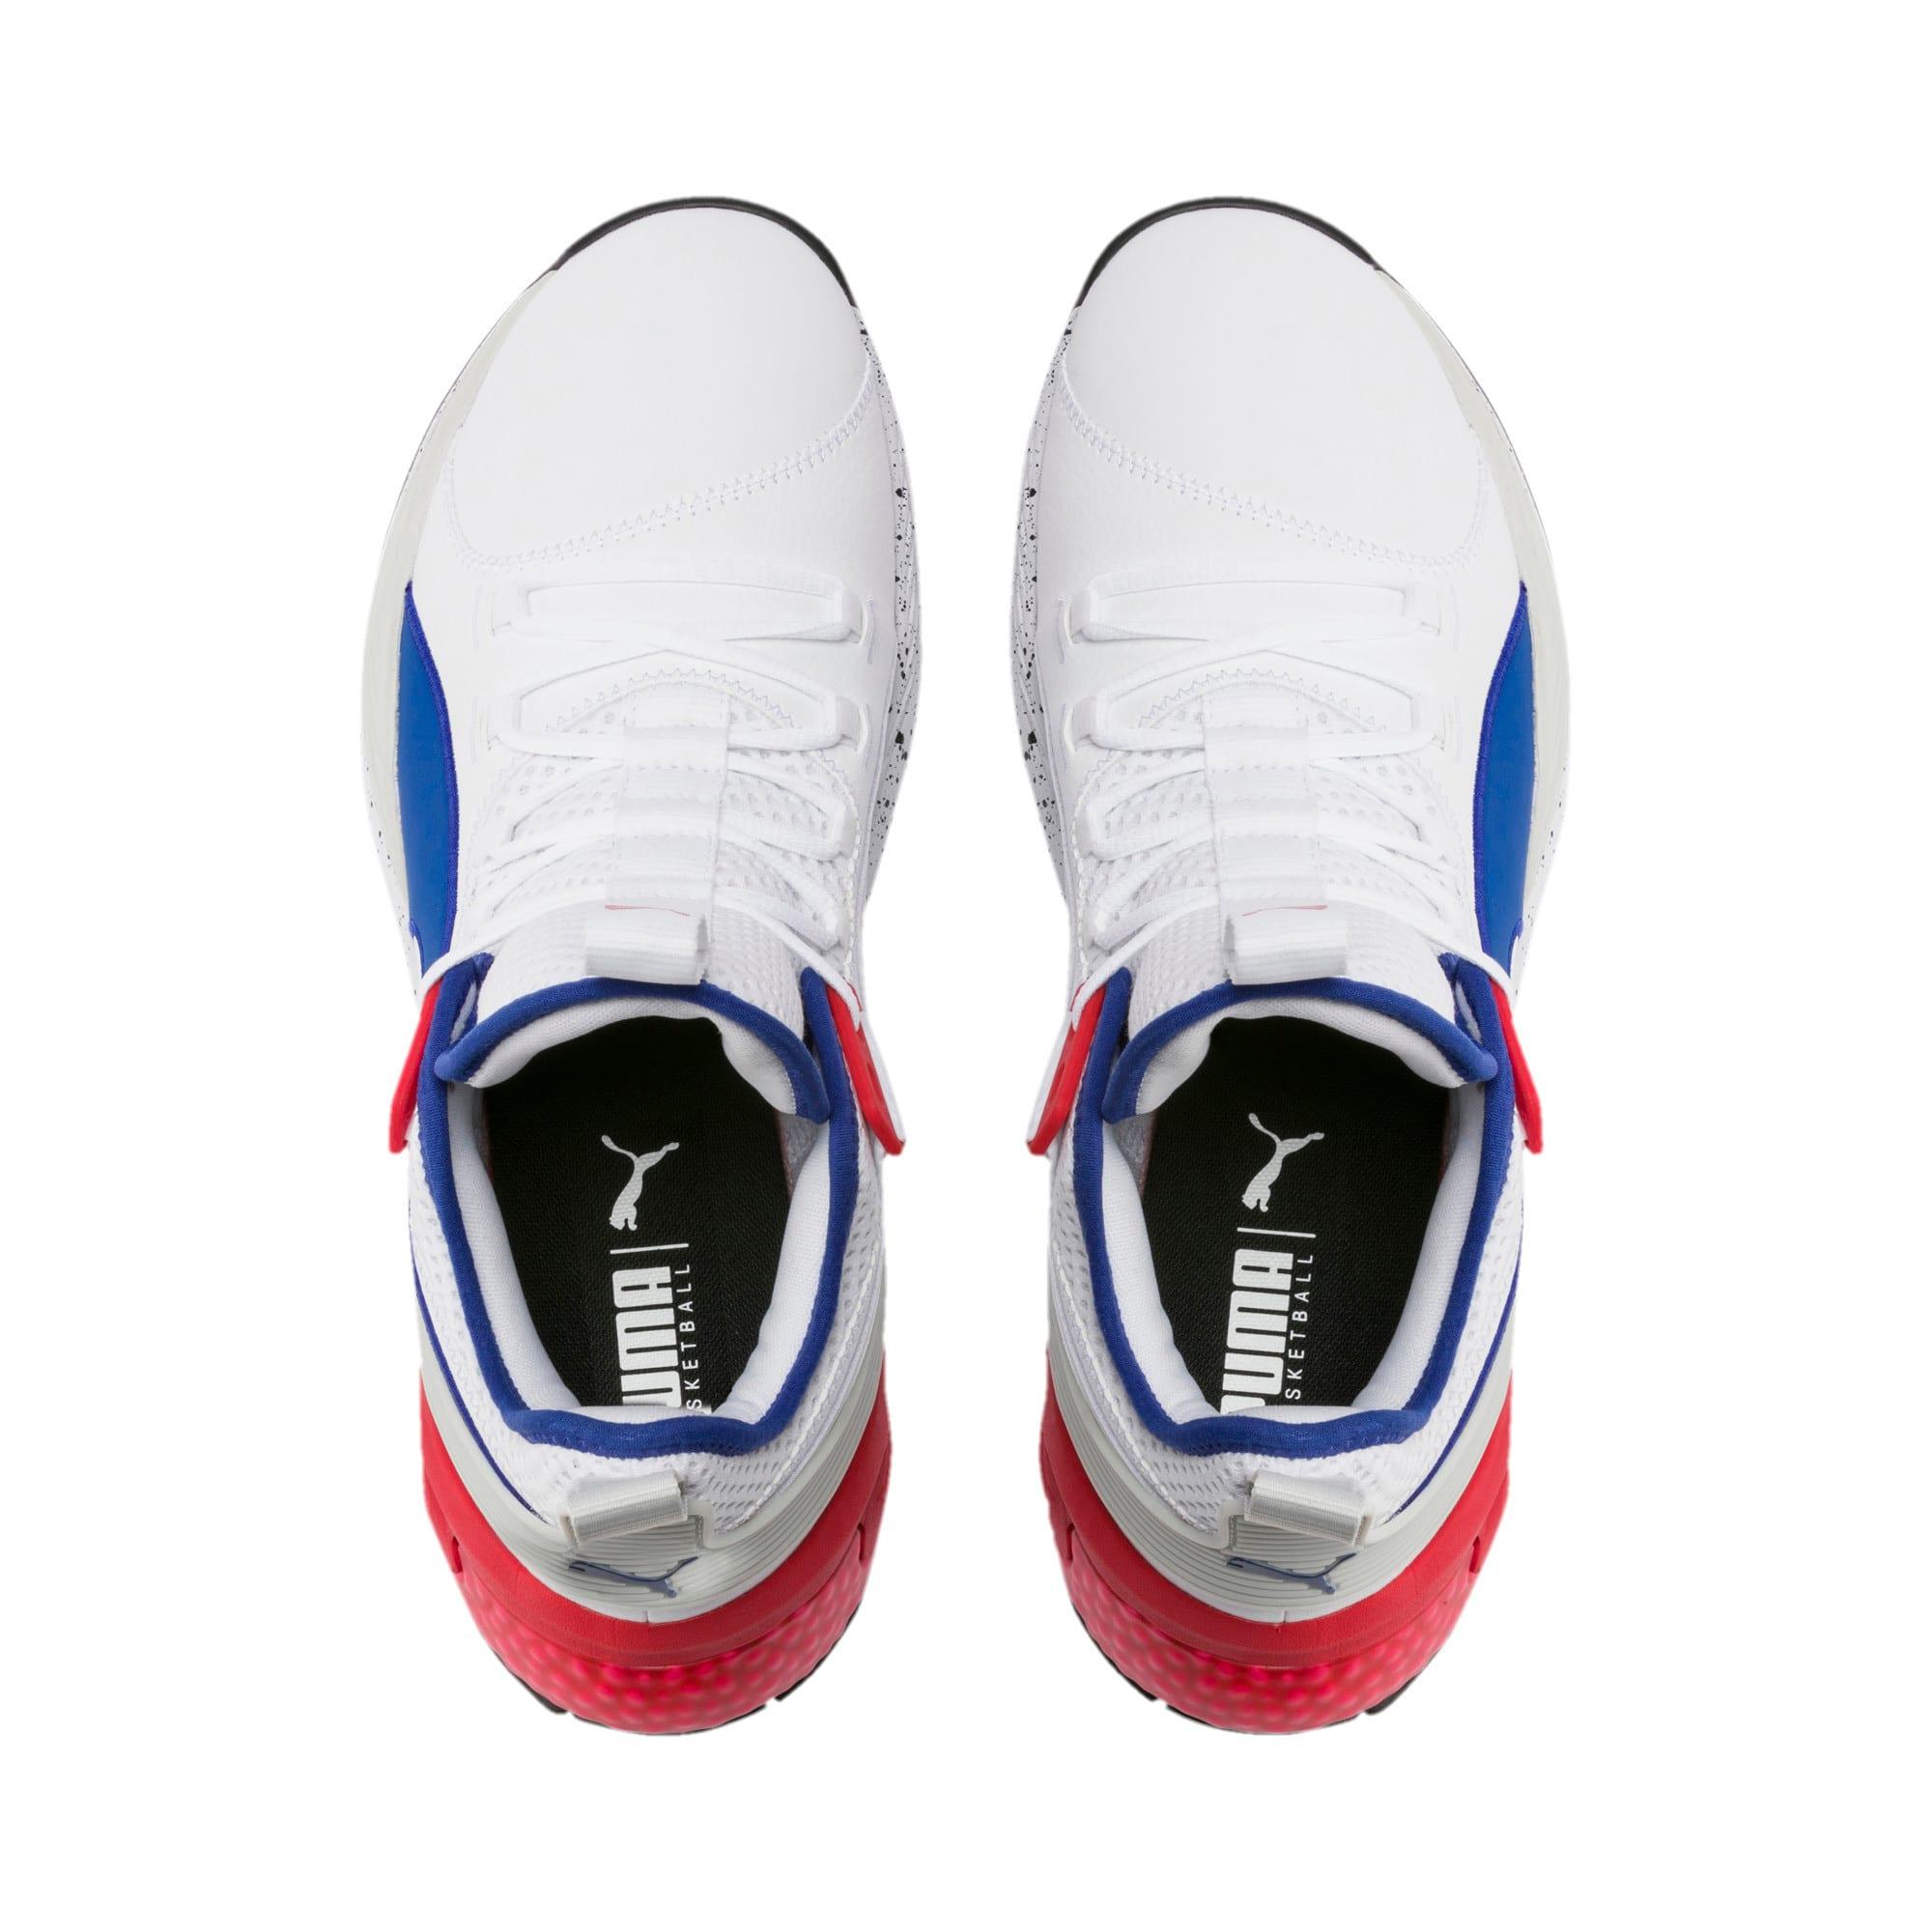 Thumbnail 6 of Chaussure de basketball Uproar Palace Guard pour homme, Puma White-Surf The Web, medium